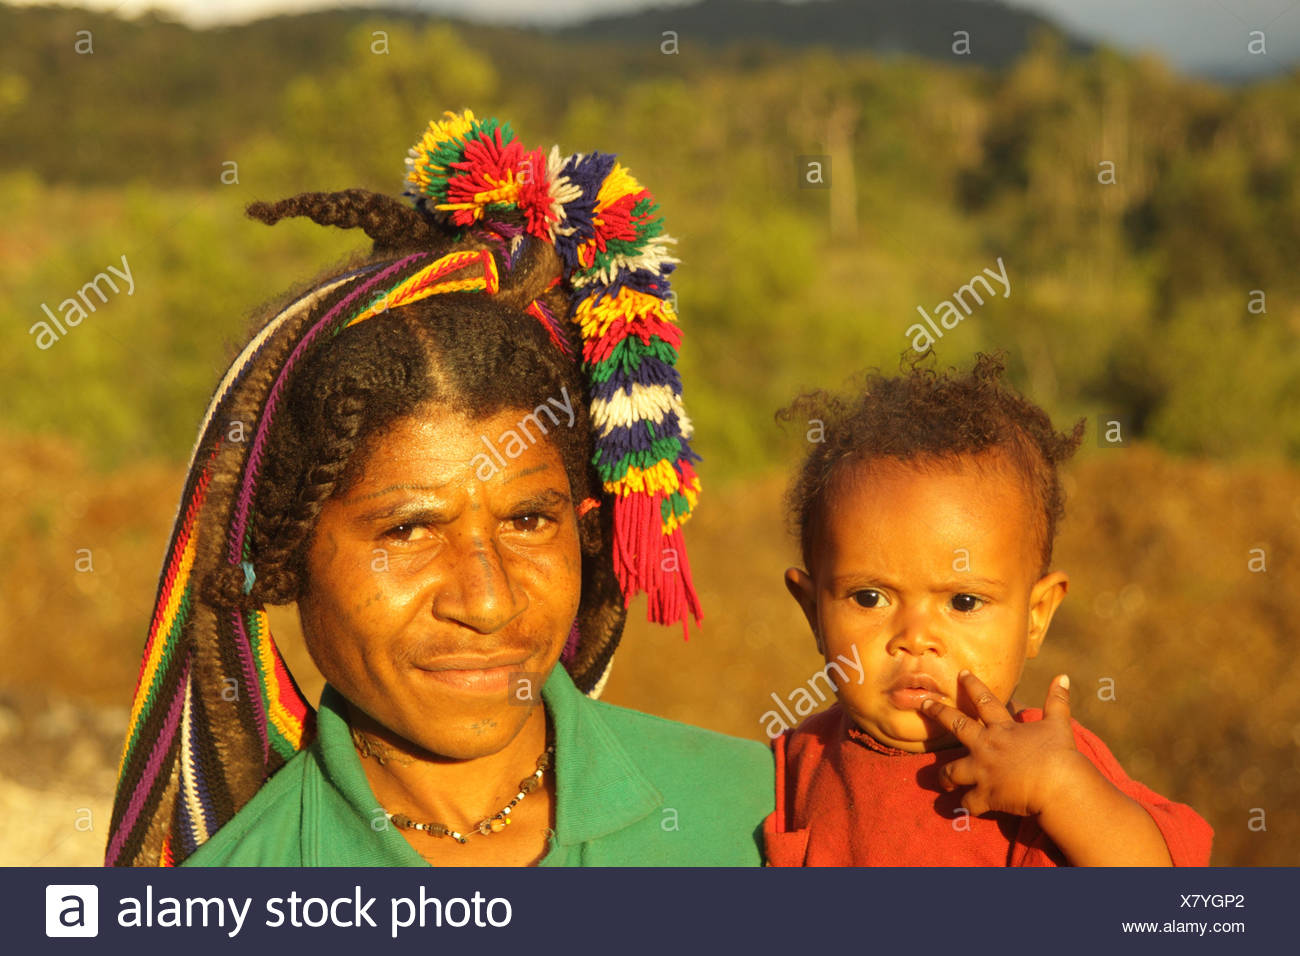 culture, ethnic, person, indigenous, people, native, tribes, tribeswoman, highlander, mother, child, Huli, Tari, valley, Tari Va - Stock Image